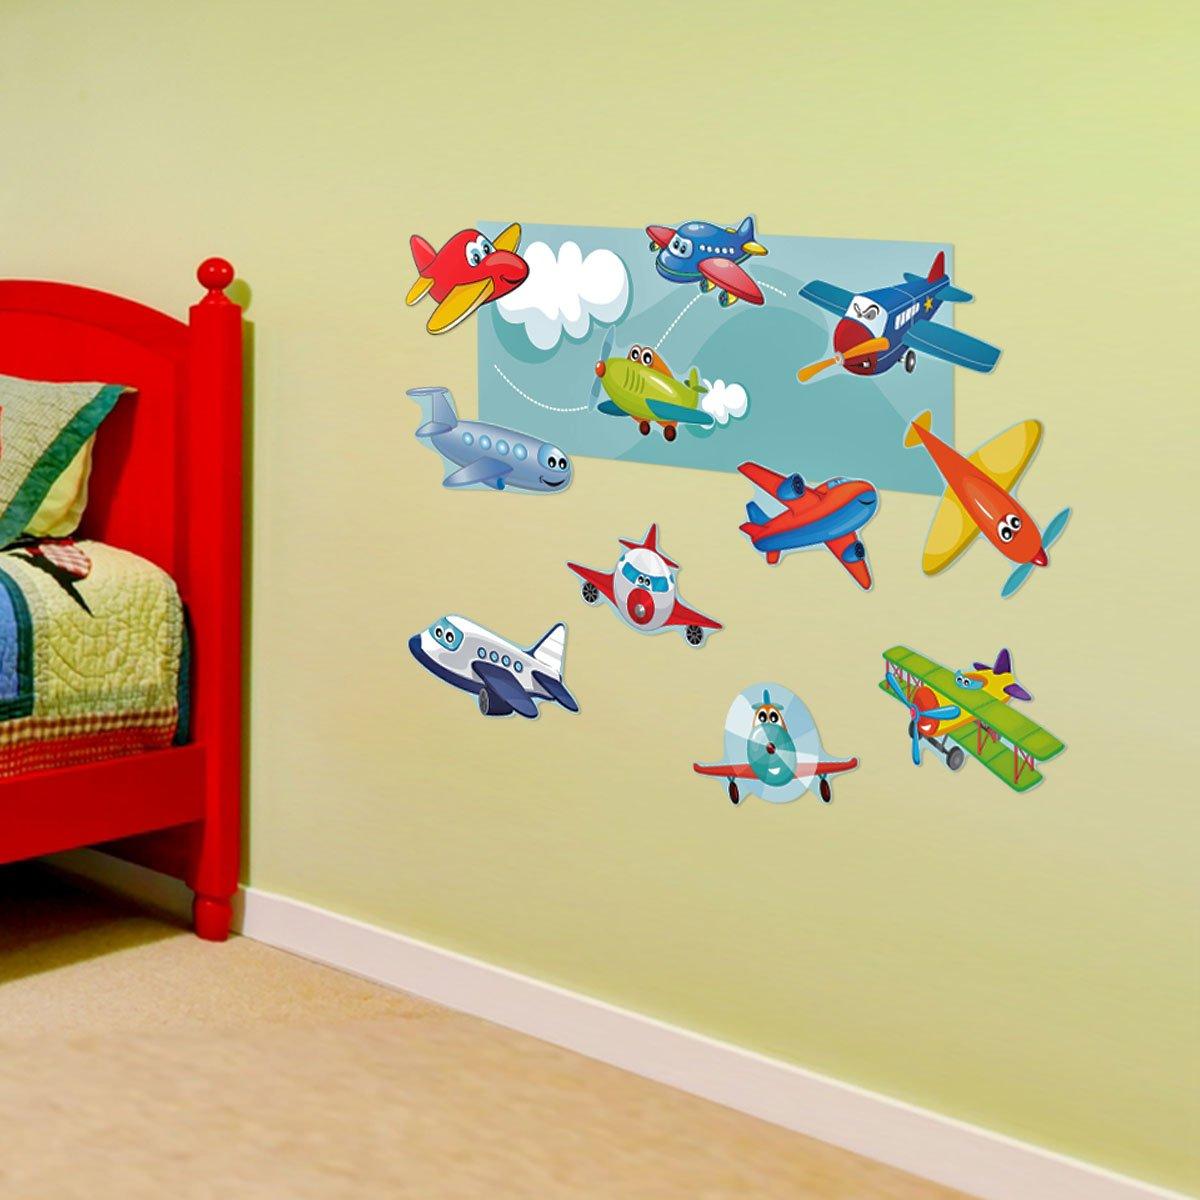 Amazon.com: Mona Melisa Designs, Interactive Wall Play Set, Planes ...